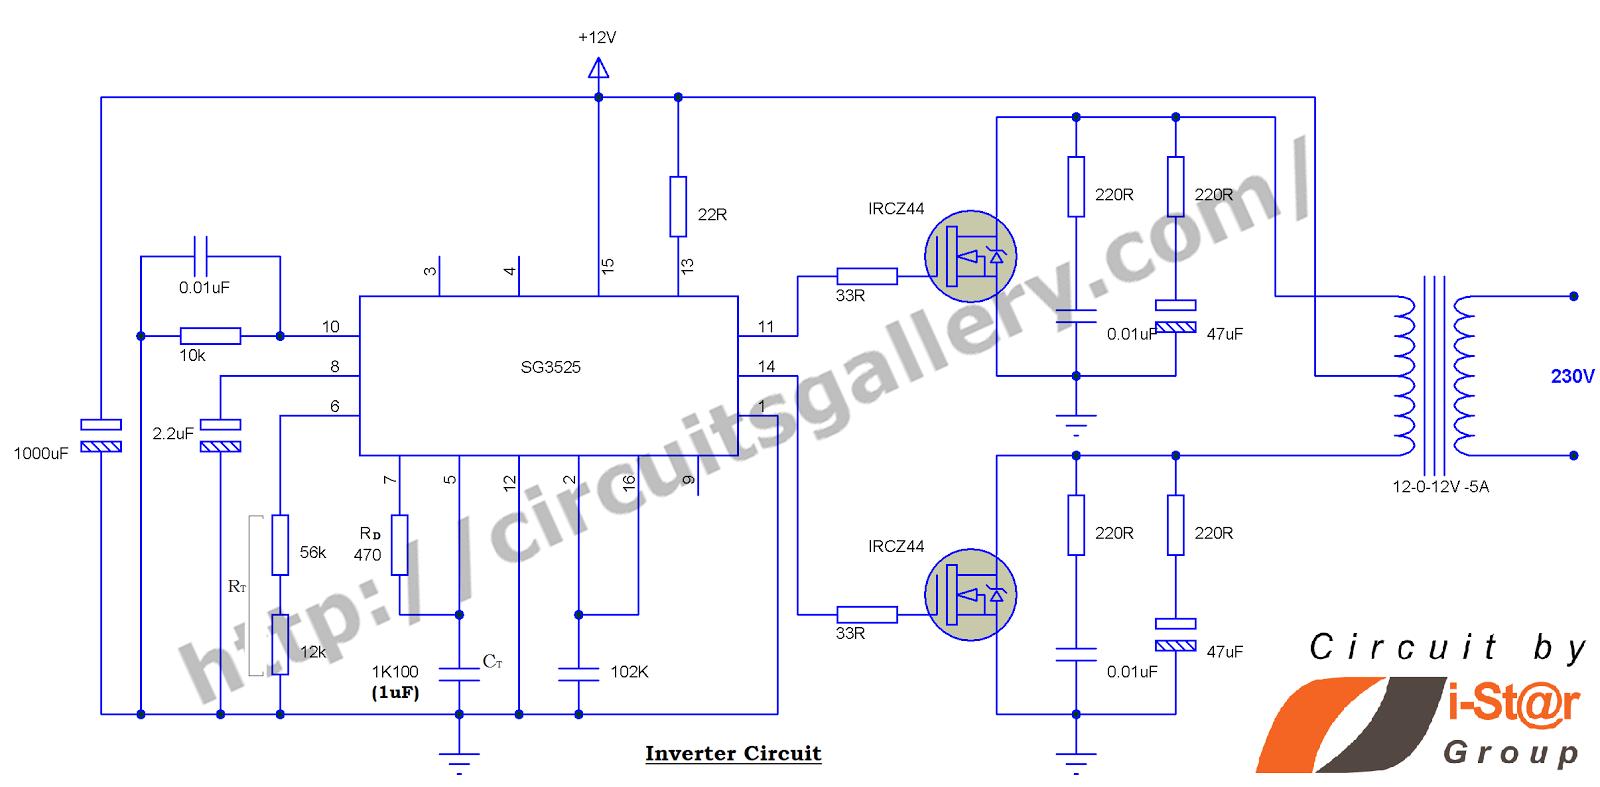 Circuit Diagram Inverter 3000wattpowerinvertercircuitdiagram13gif The Krell Lab 100 Watt Schematic Using Pulse Width